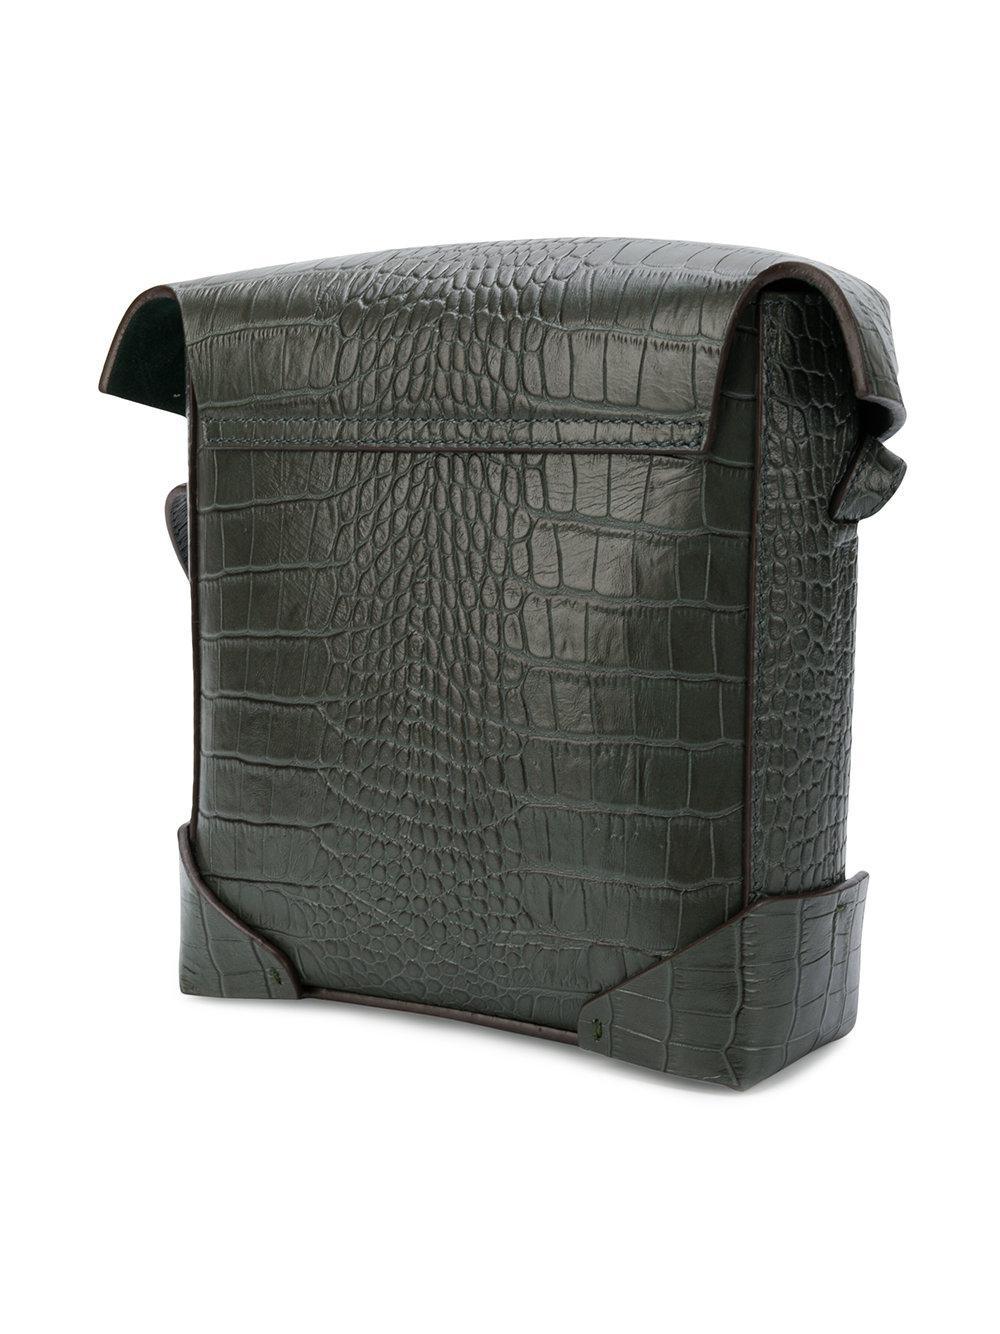 Manu Atelier HANDBAGS - Cross-body bags su YOOX.COM ZpYyeCXx